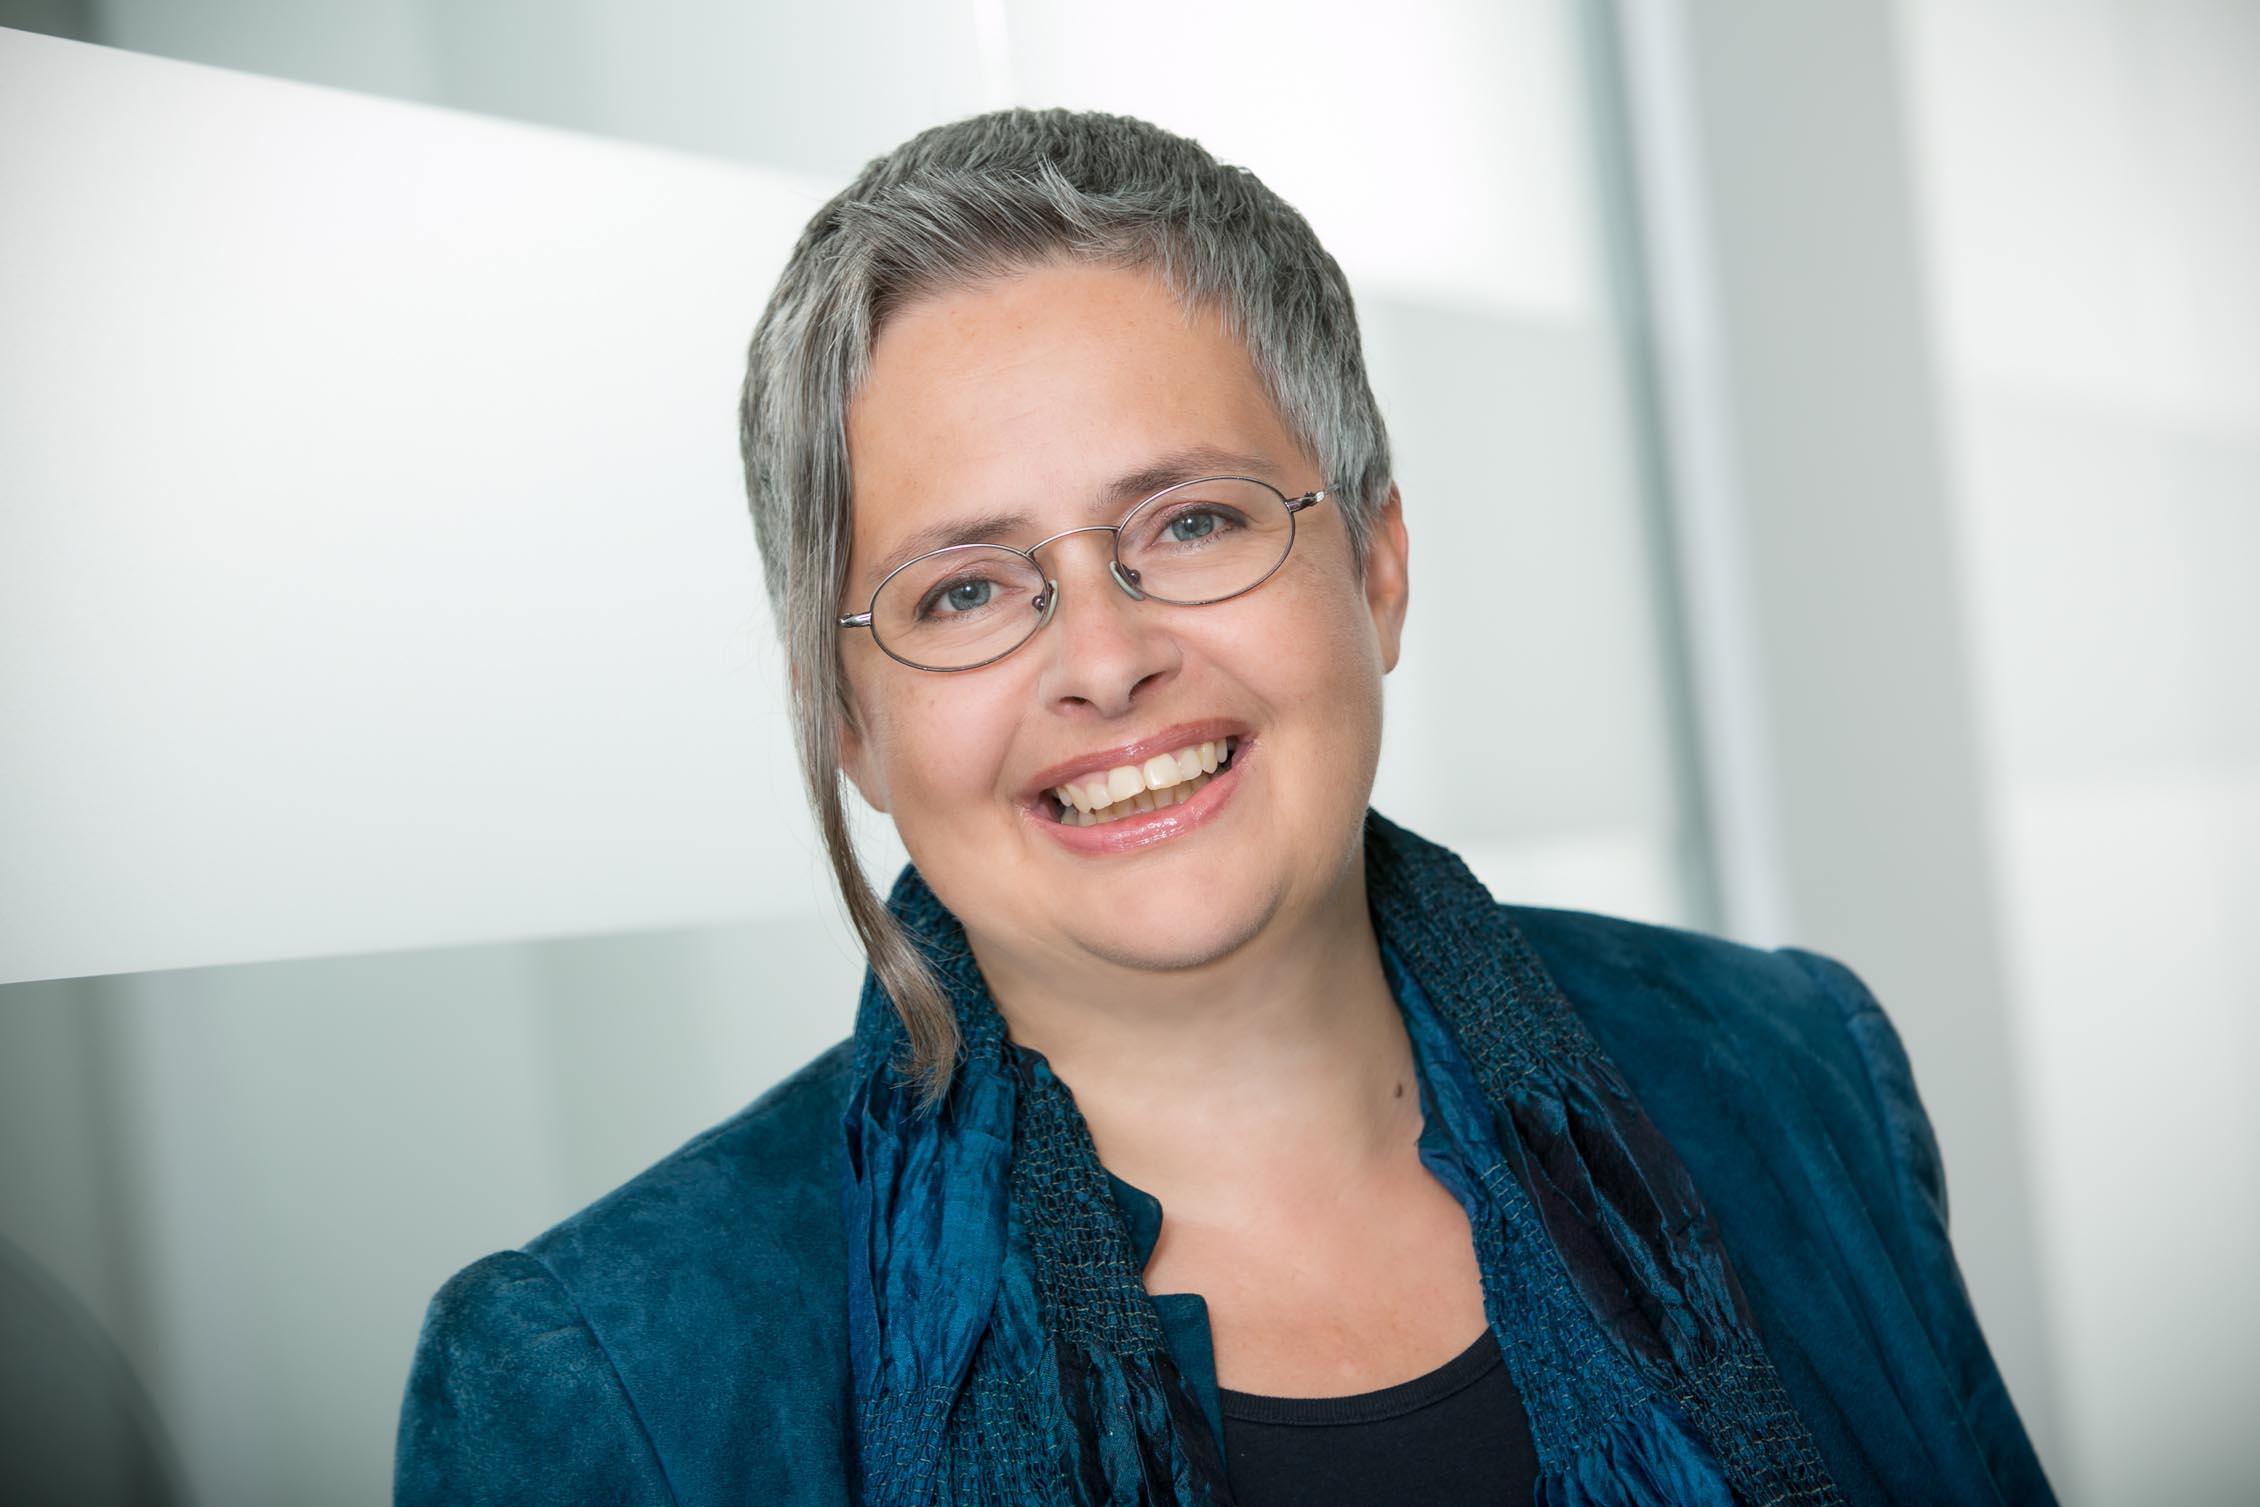 Sylvia Göttinger